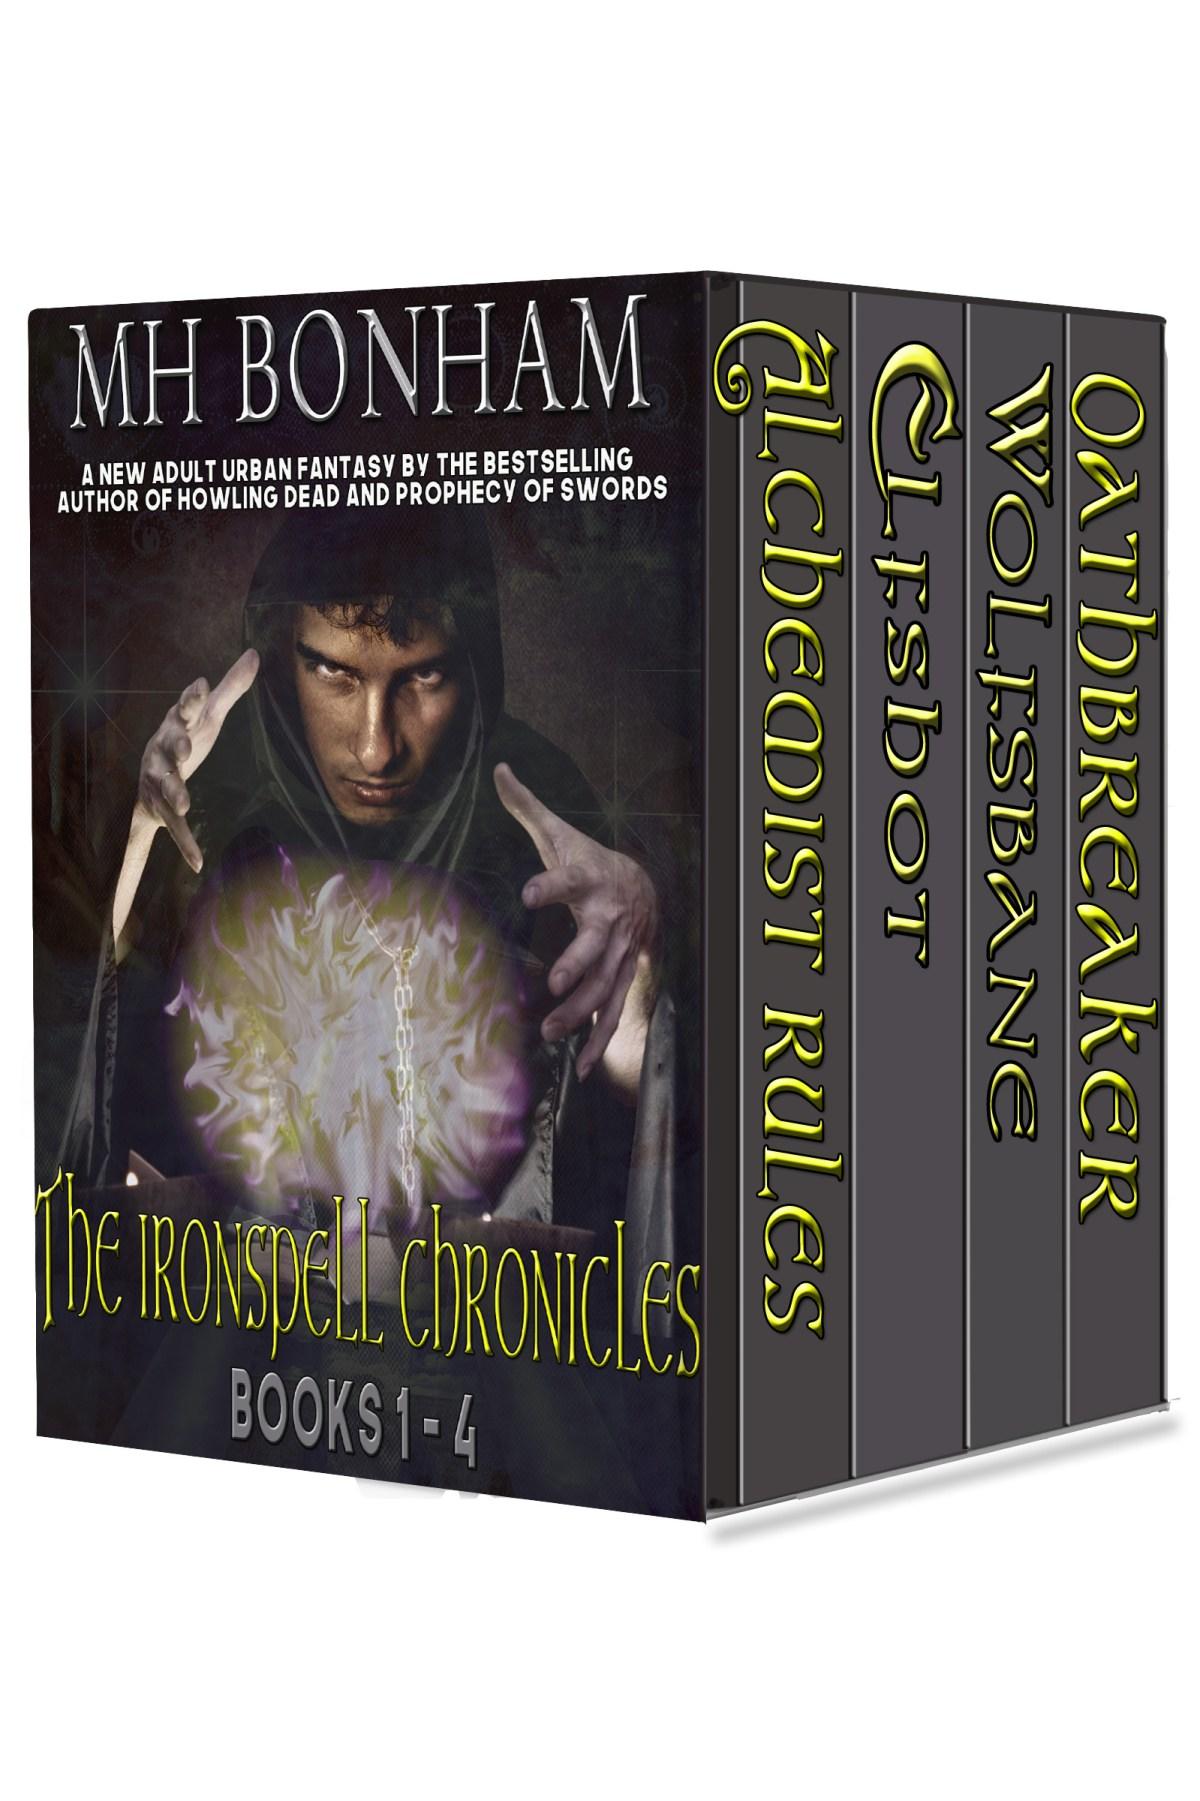 Fiction by MH Bonham